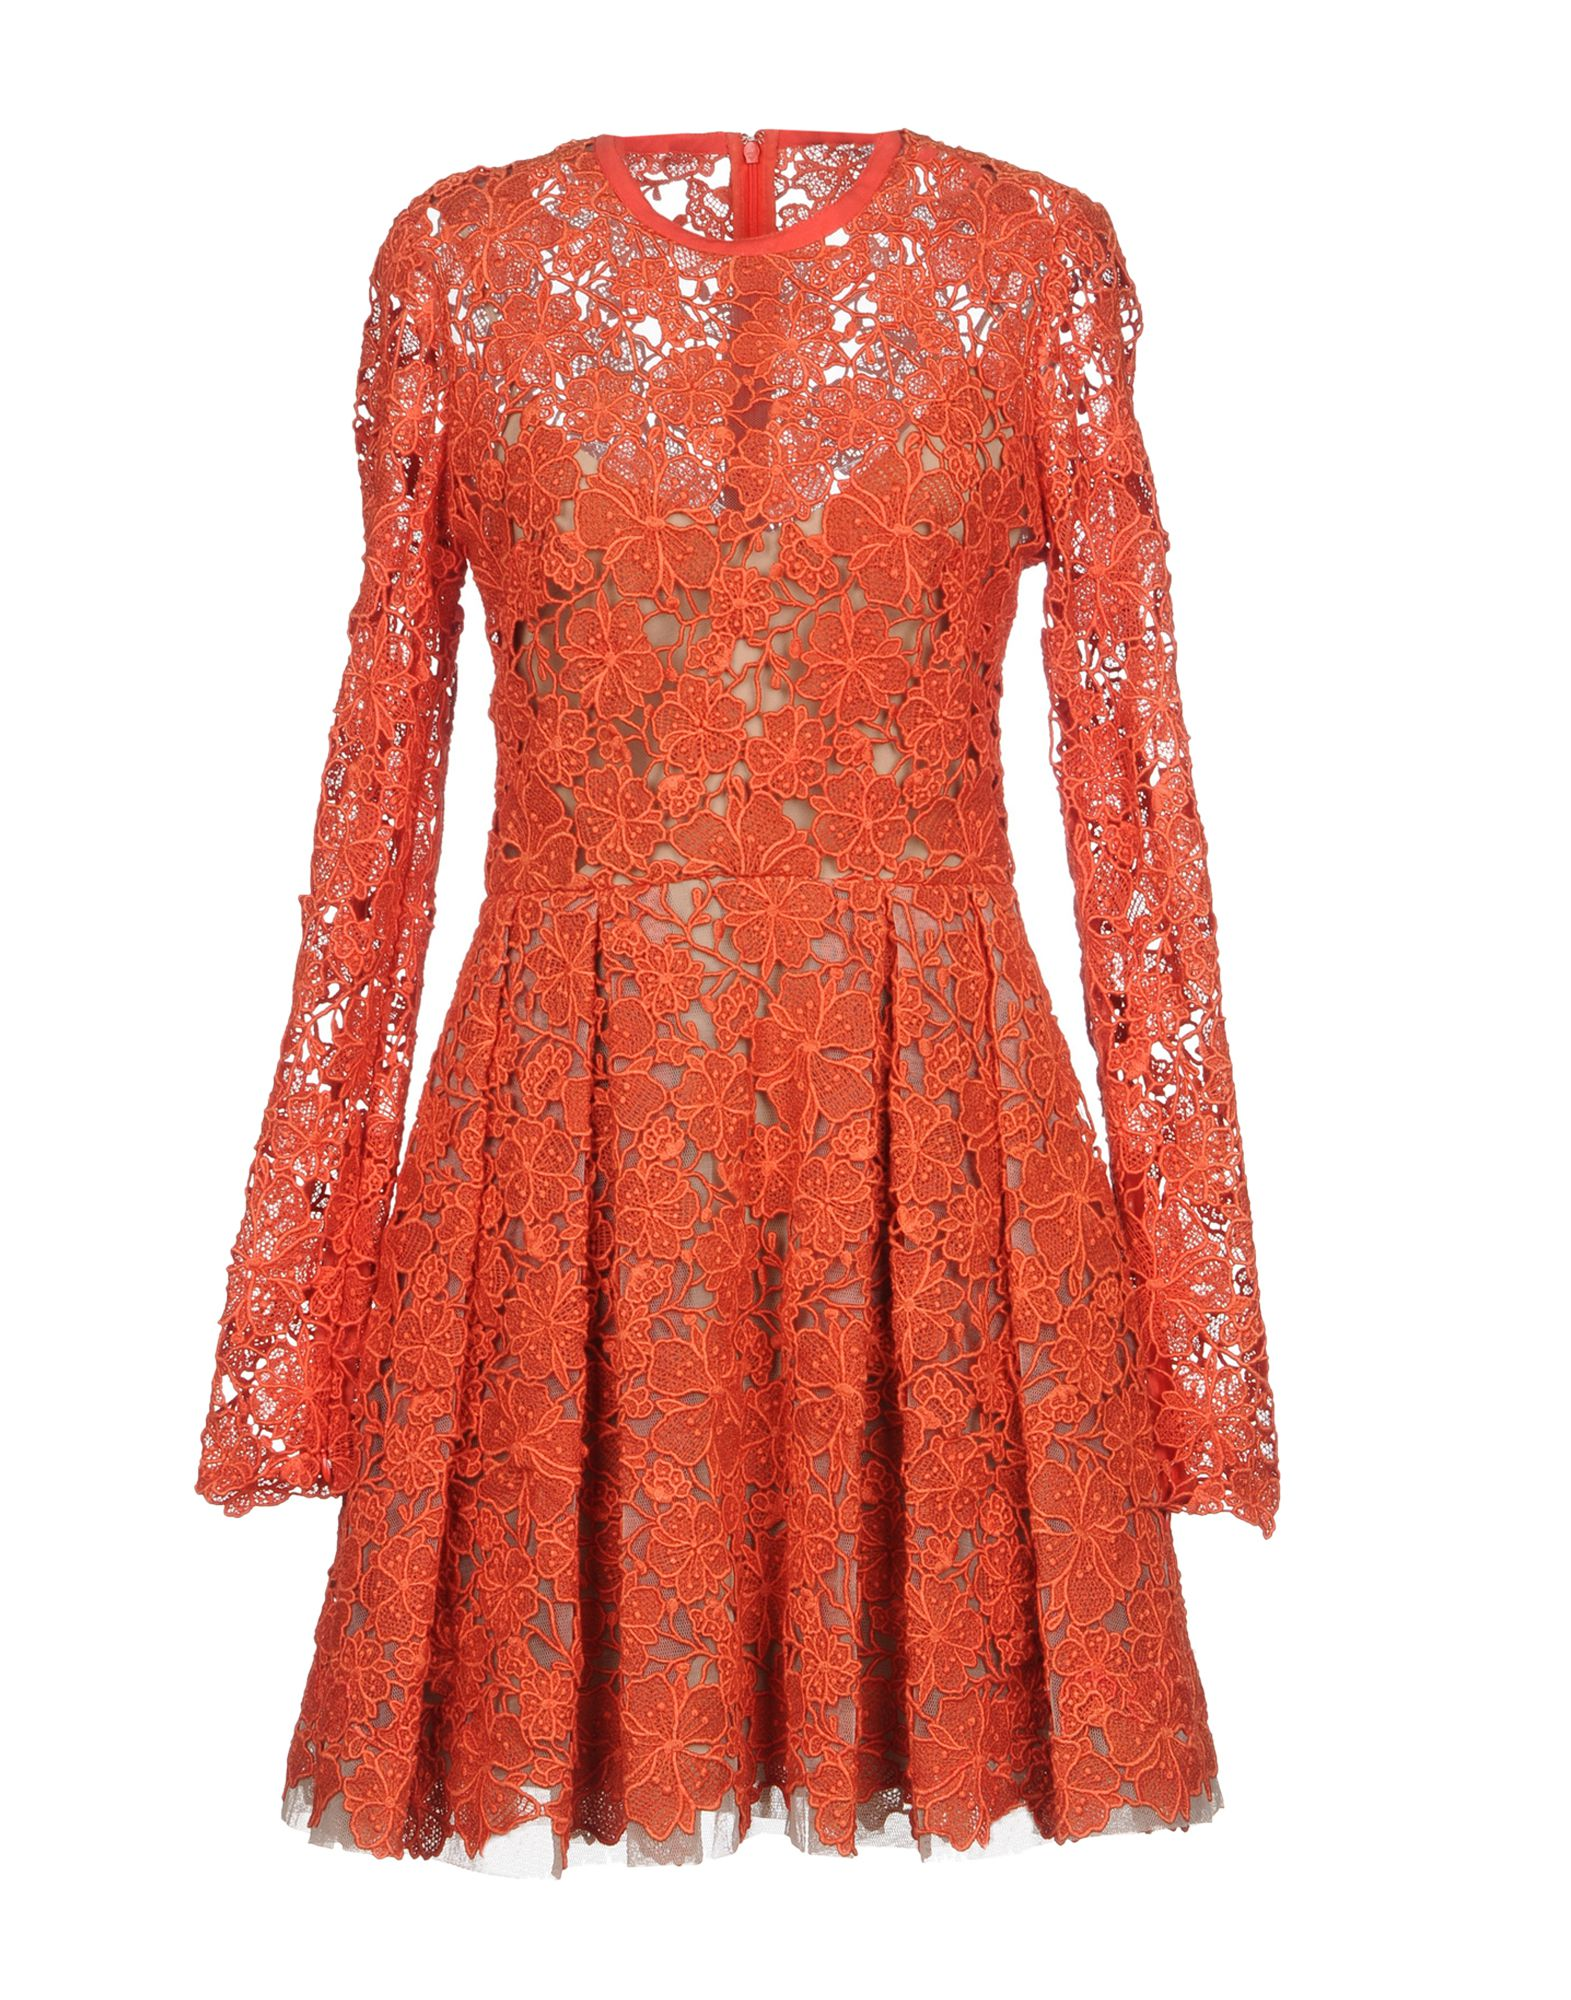 ELIE SAAB Короткое платье вечернее платье mermaid dress vestido noiva 2015 w006 elie saab evening dress